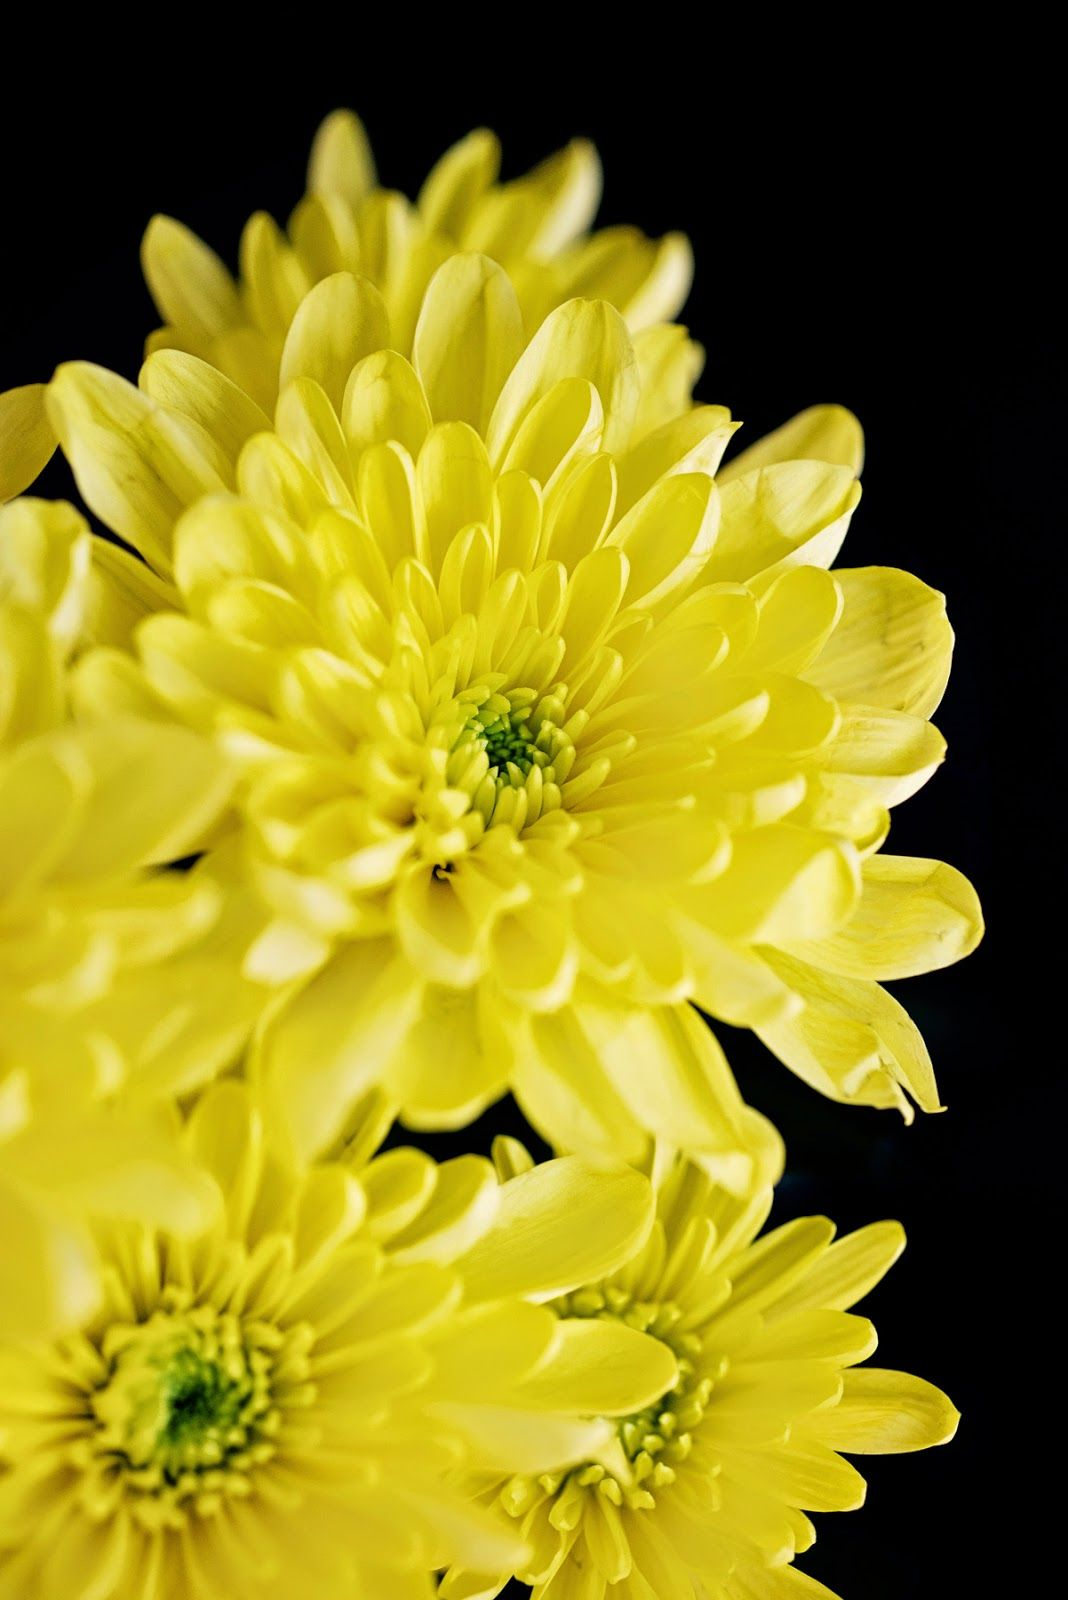 Birth Flowers November chrysanthemums Birth flowers